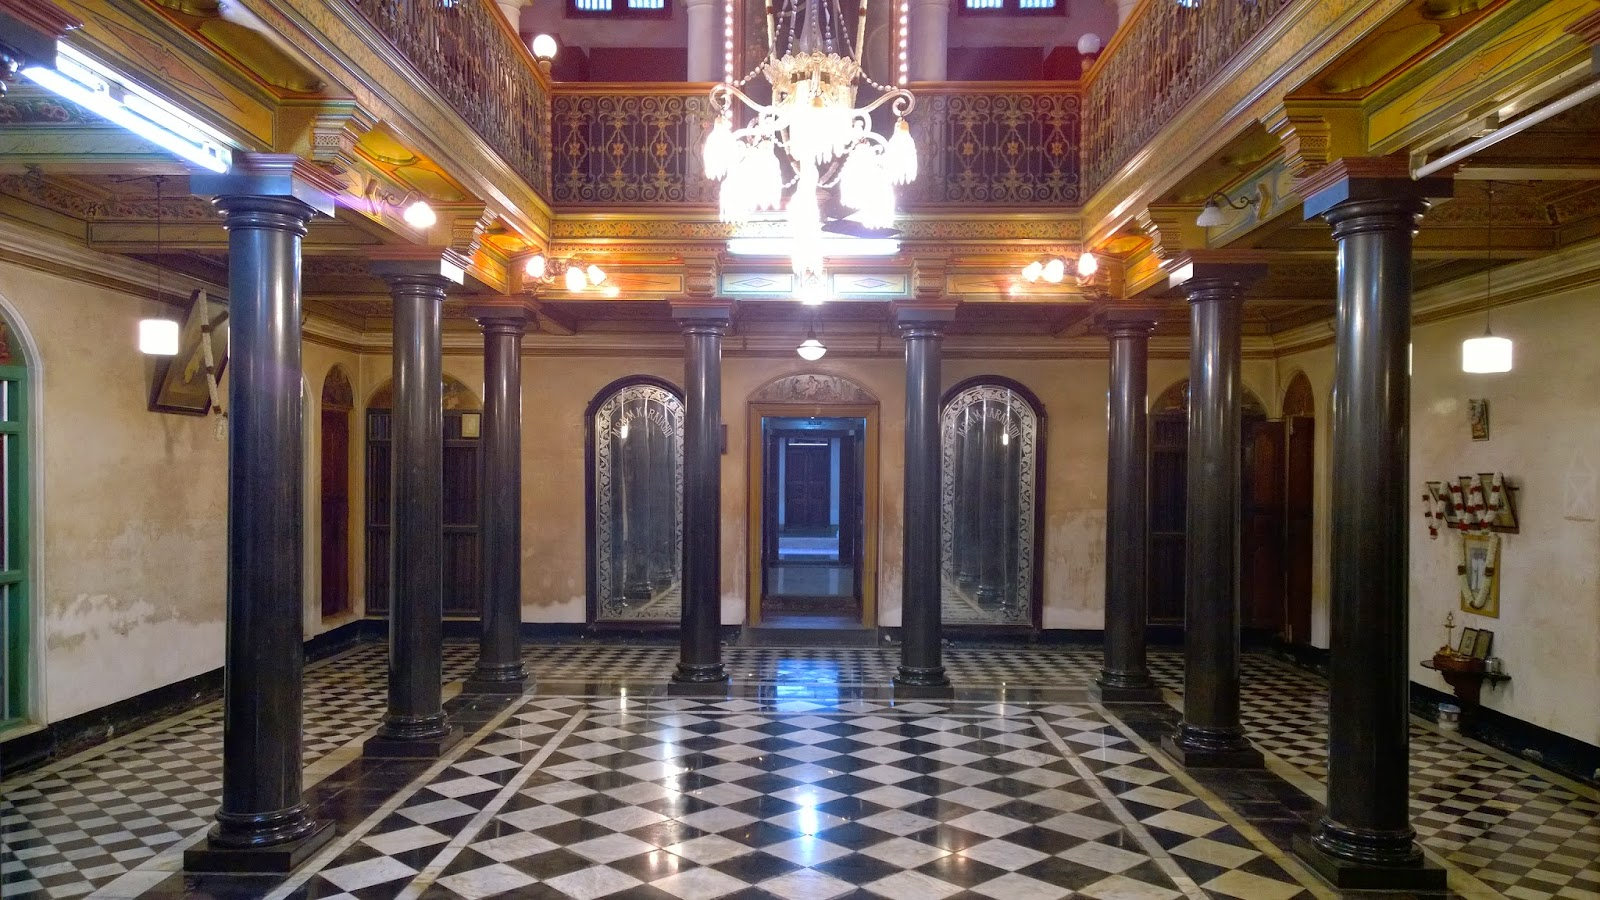 Http www achelsekluis org general home html - Chettinad Palace